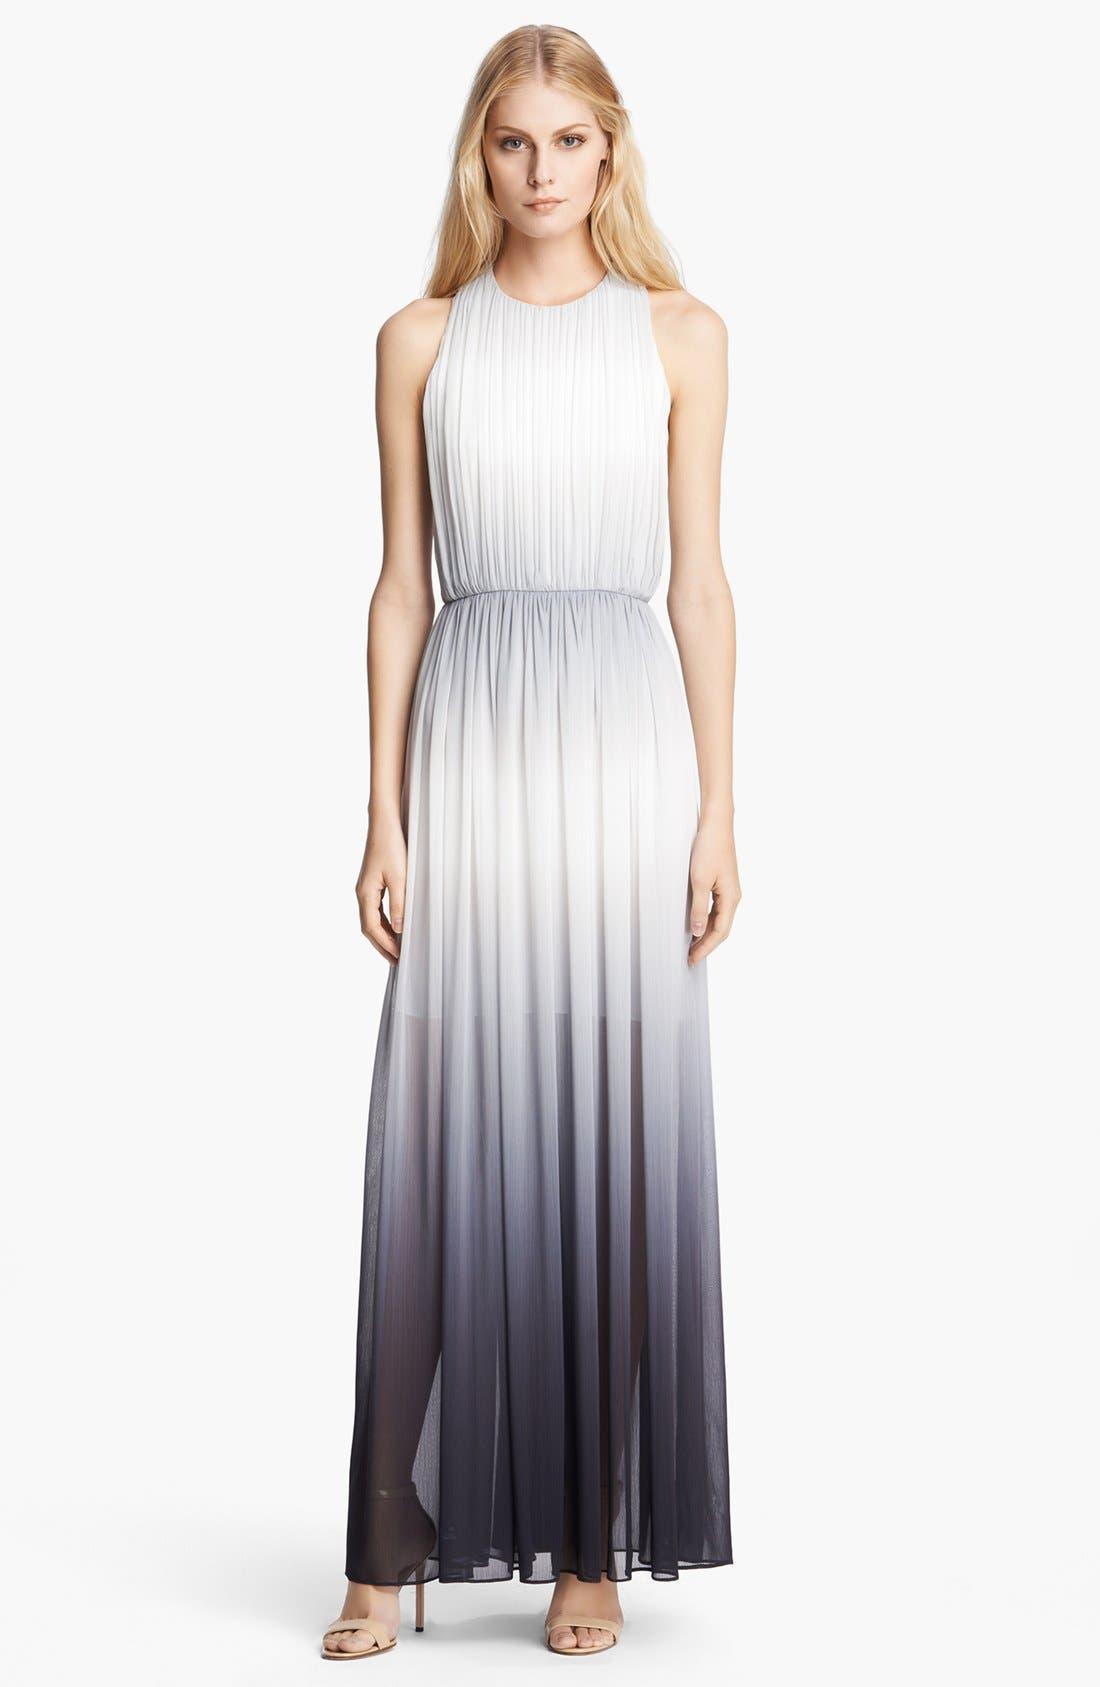 Alternate Image 1 Selected - Alice + Olivia 'Jinny' Gathered Dress